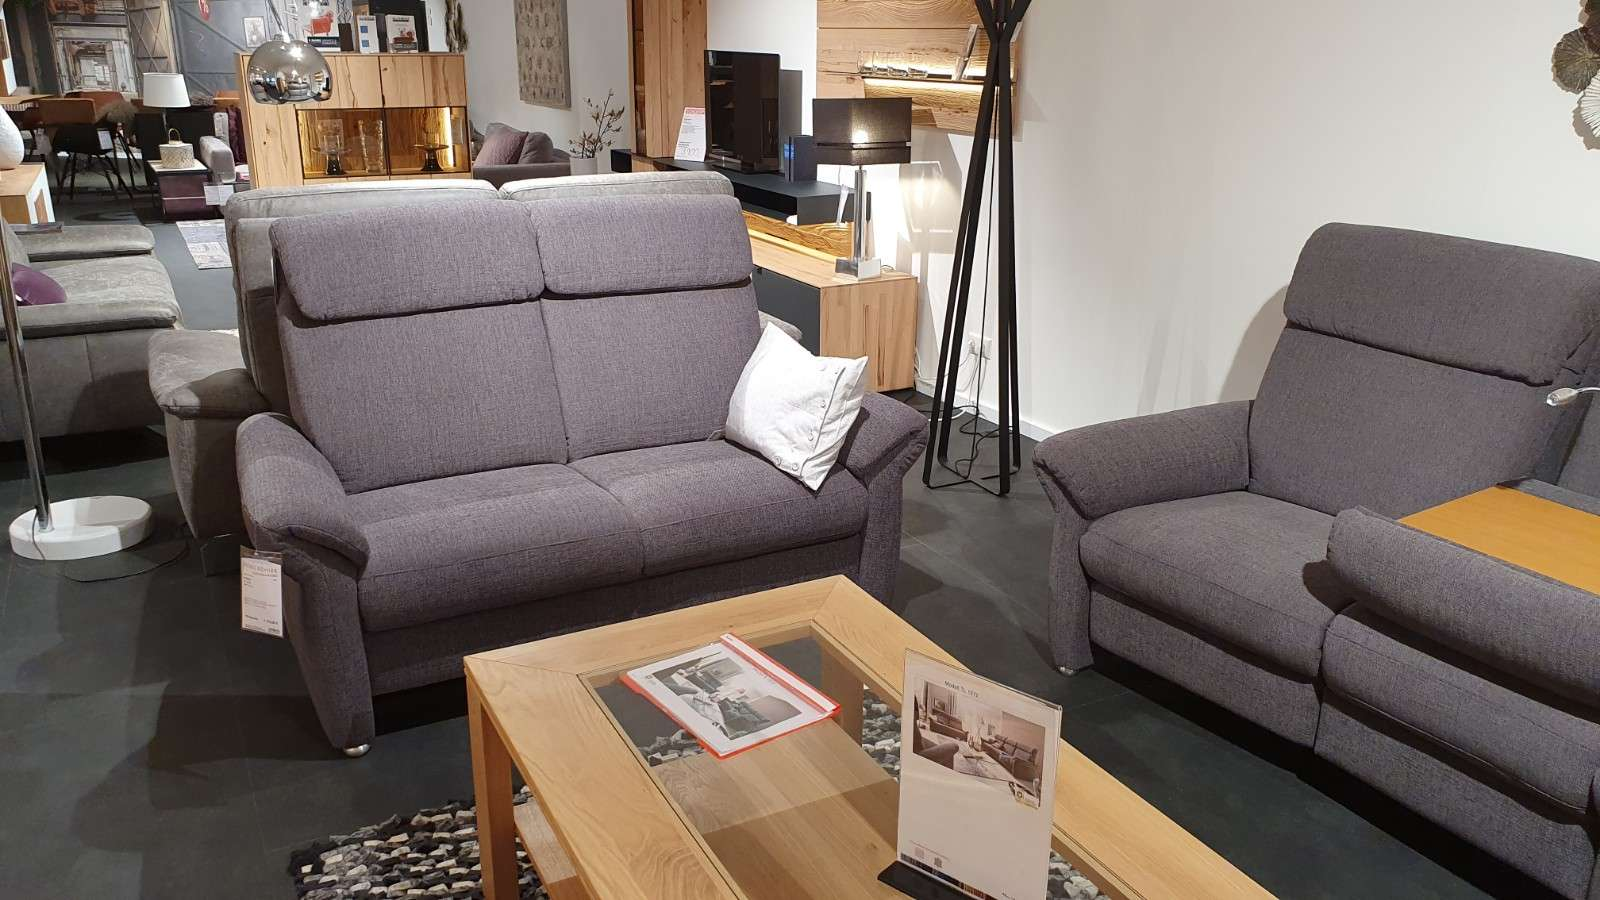 2-Sitzer Sofa mit Sessel